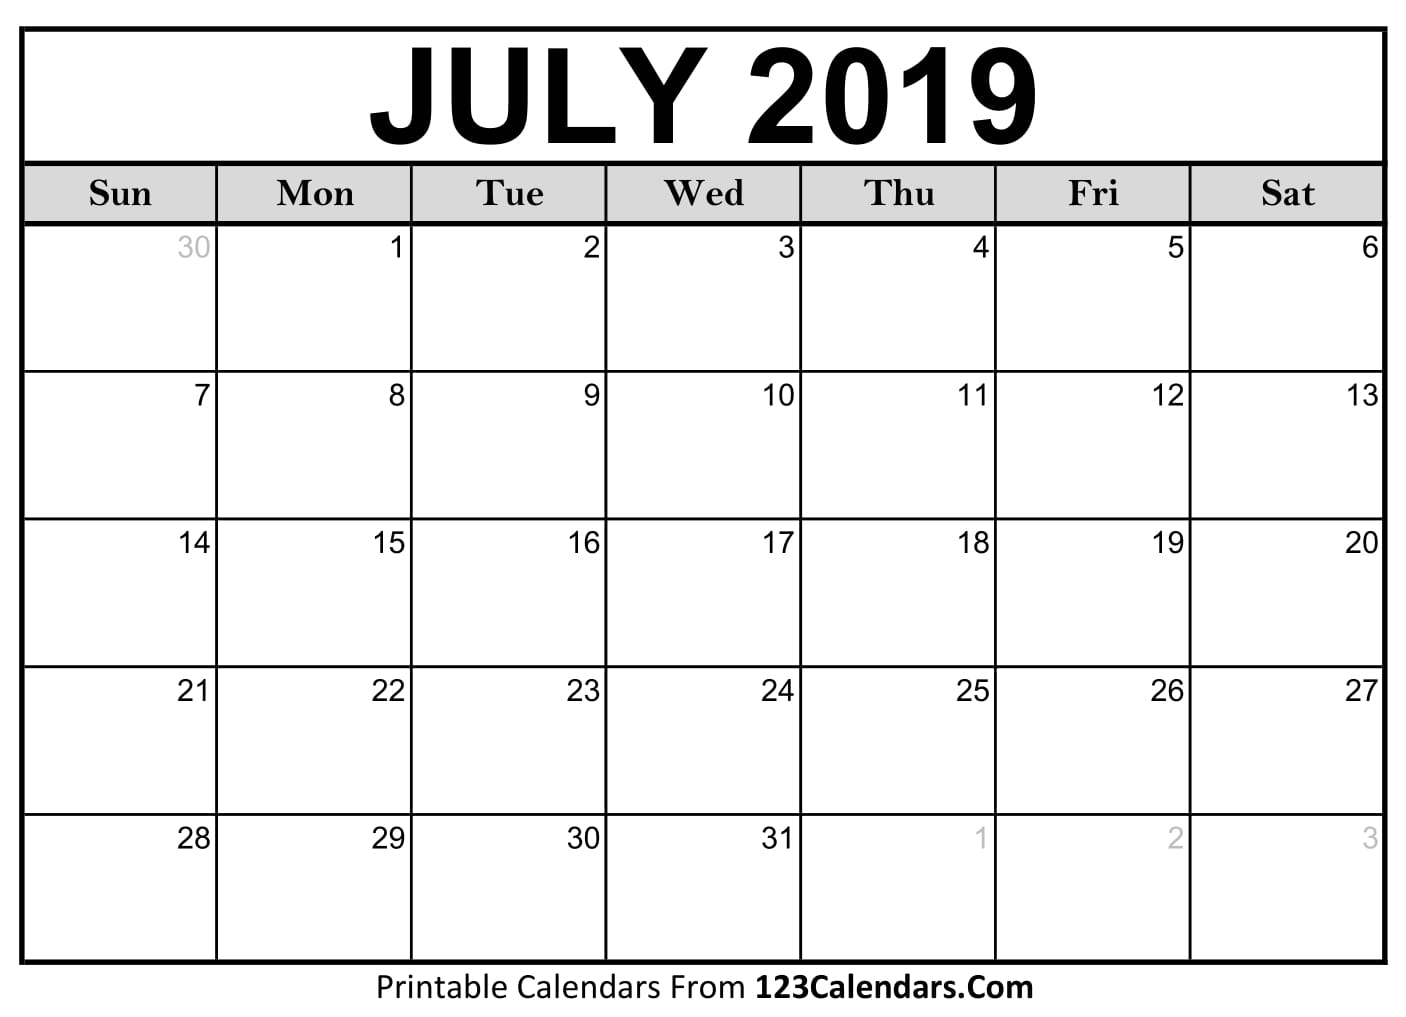 2019 Calendar July July 2019 Printable Calendar | 123Calendars.com